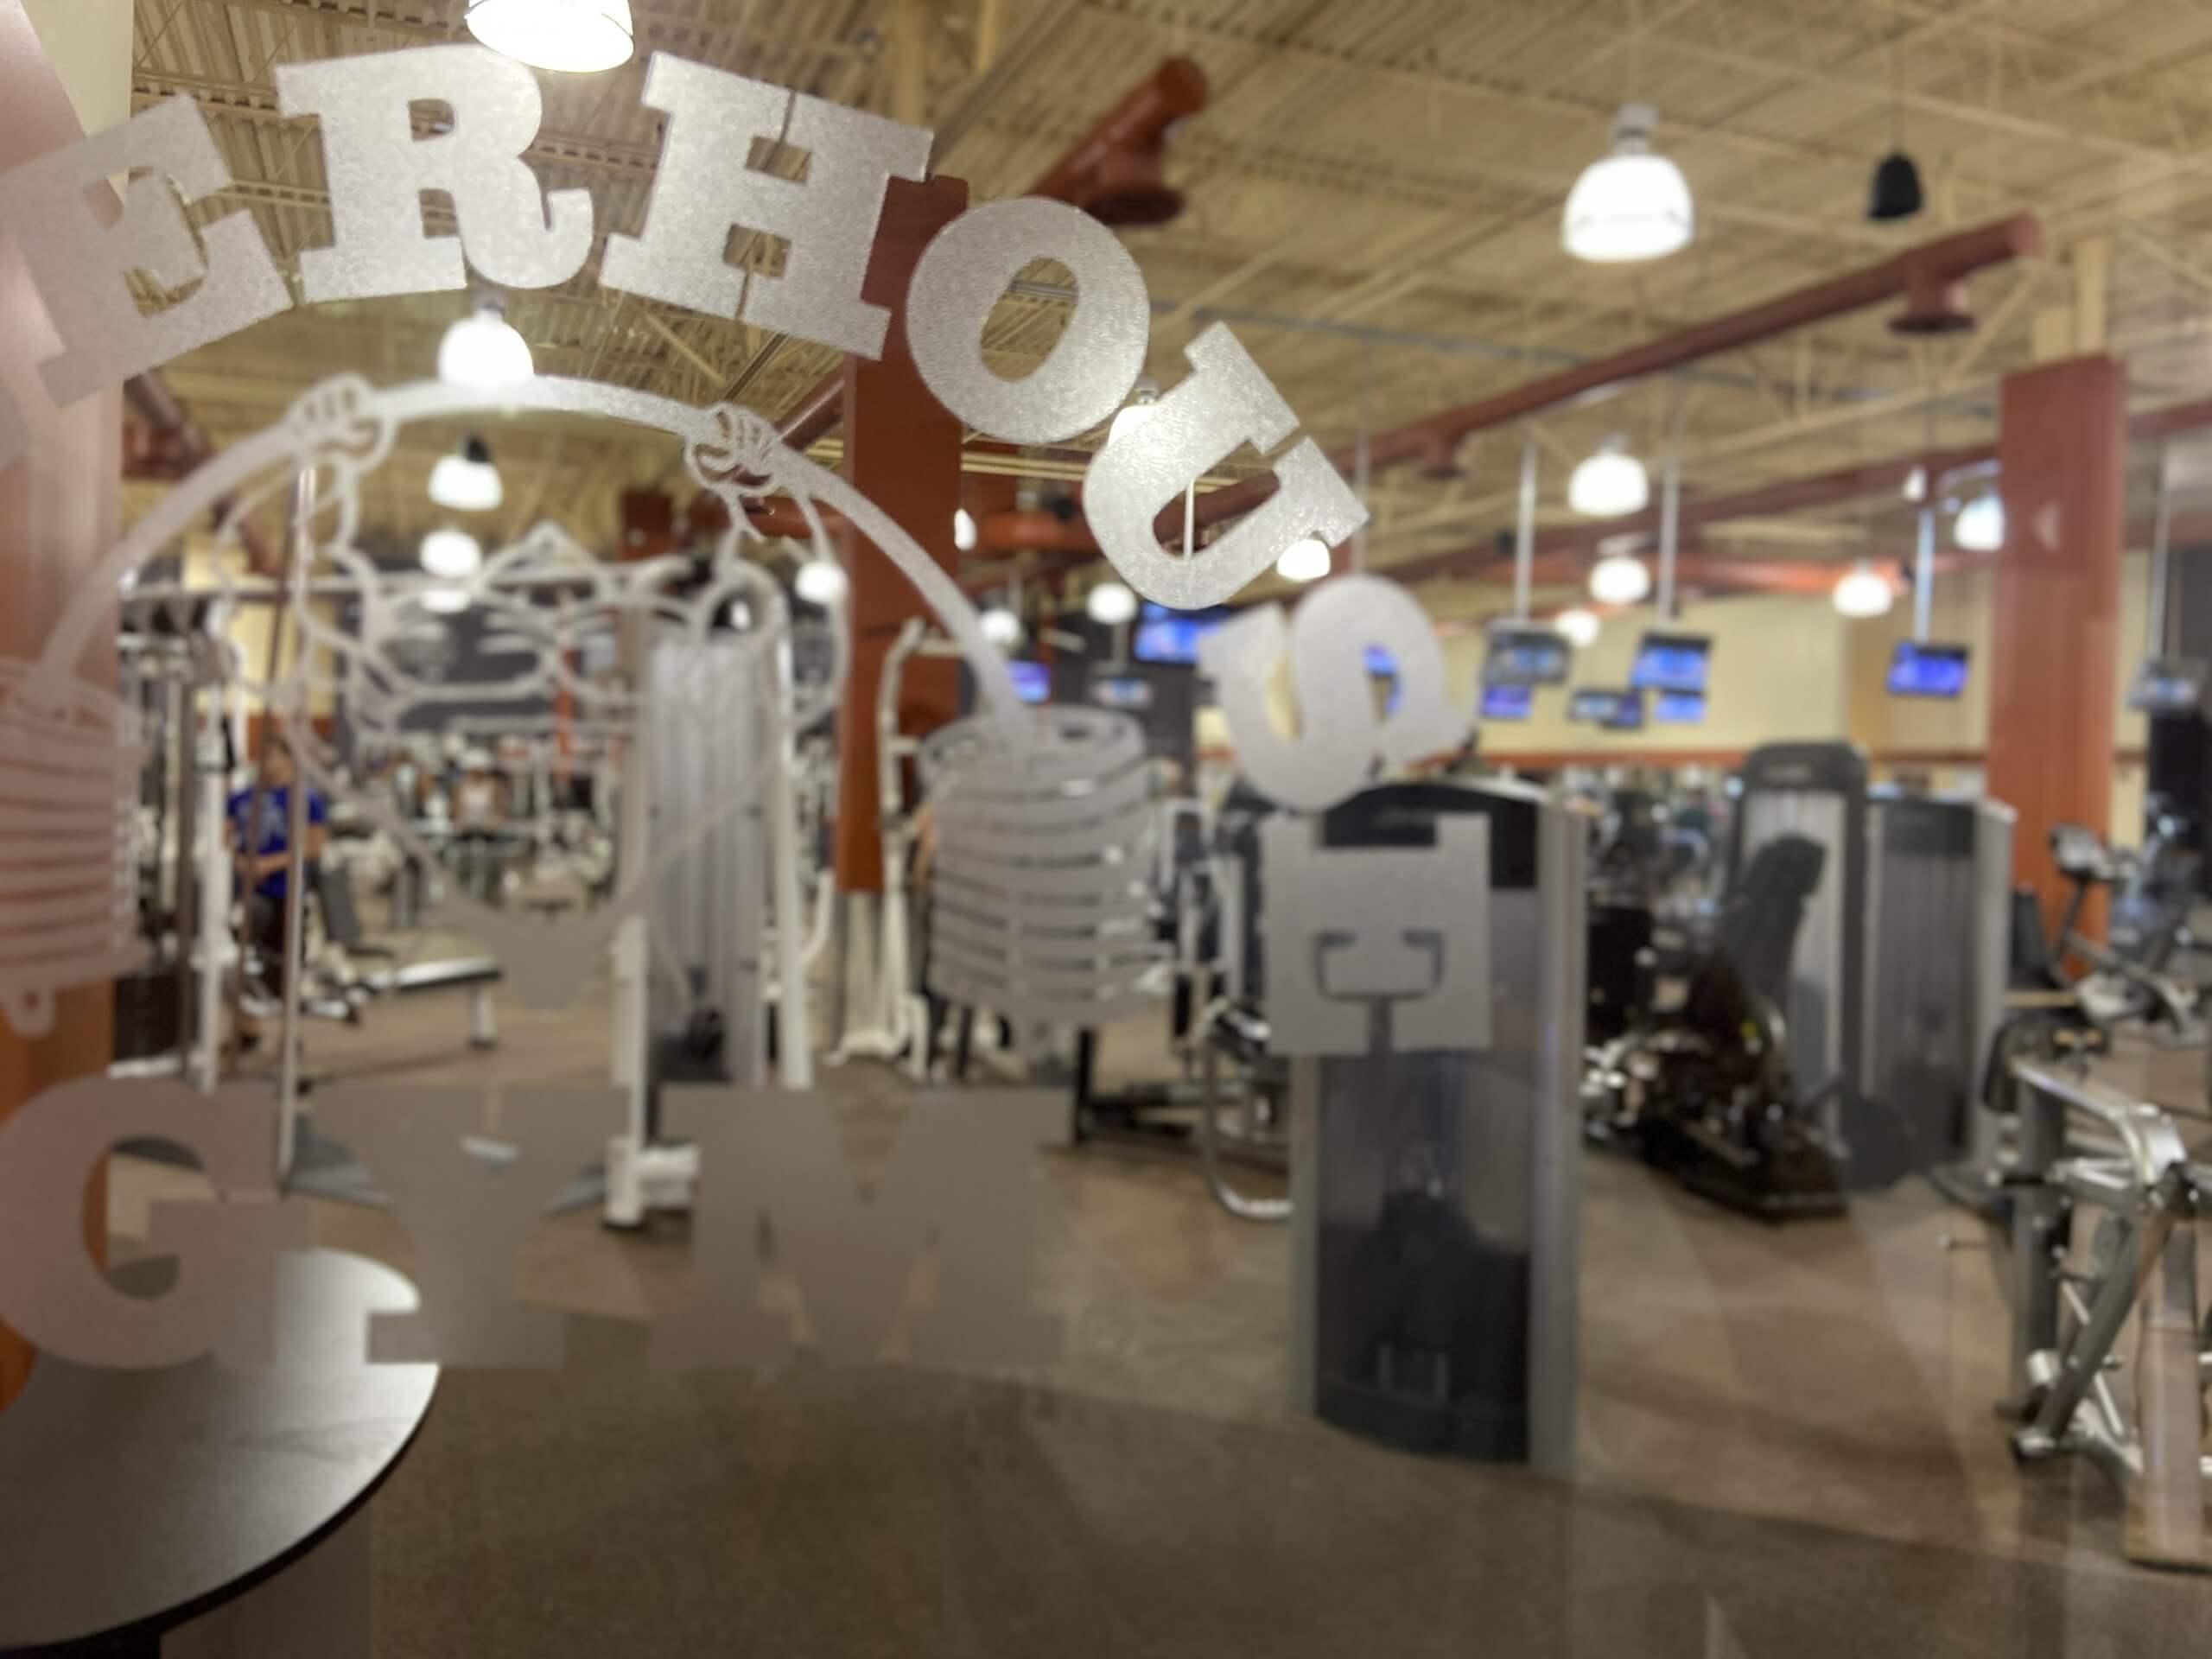 An Image of the Stuart, FL Powerhouse Gym Location